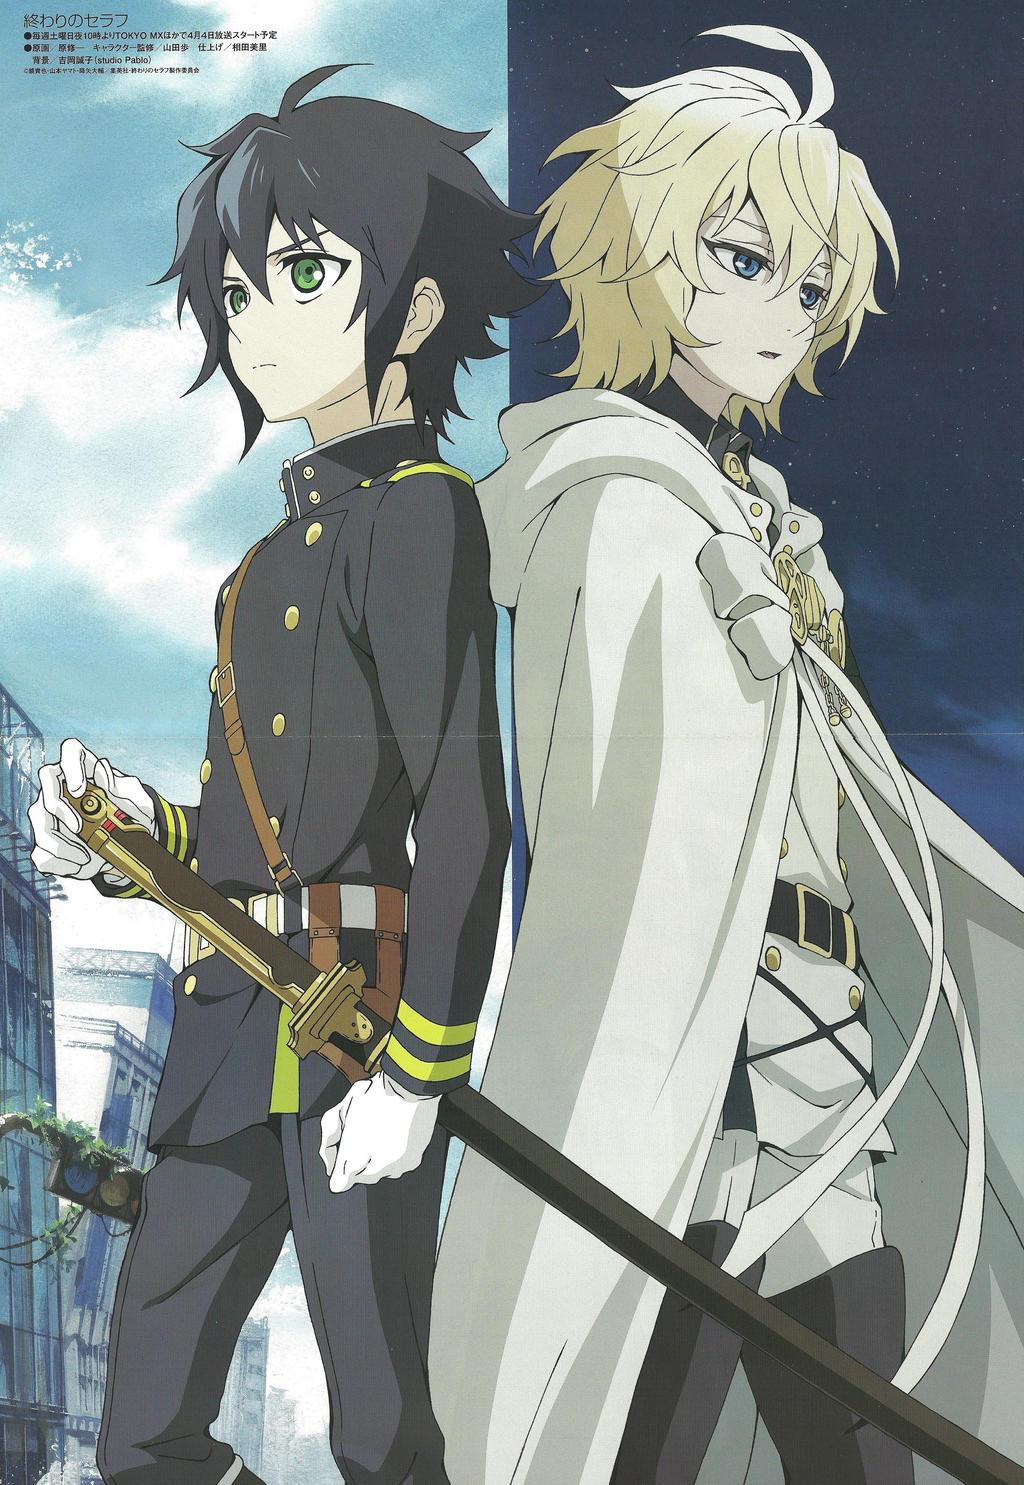 M O M O K O A S U K A { 2 }: [Reseña anime] Owari no Seraph